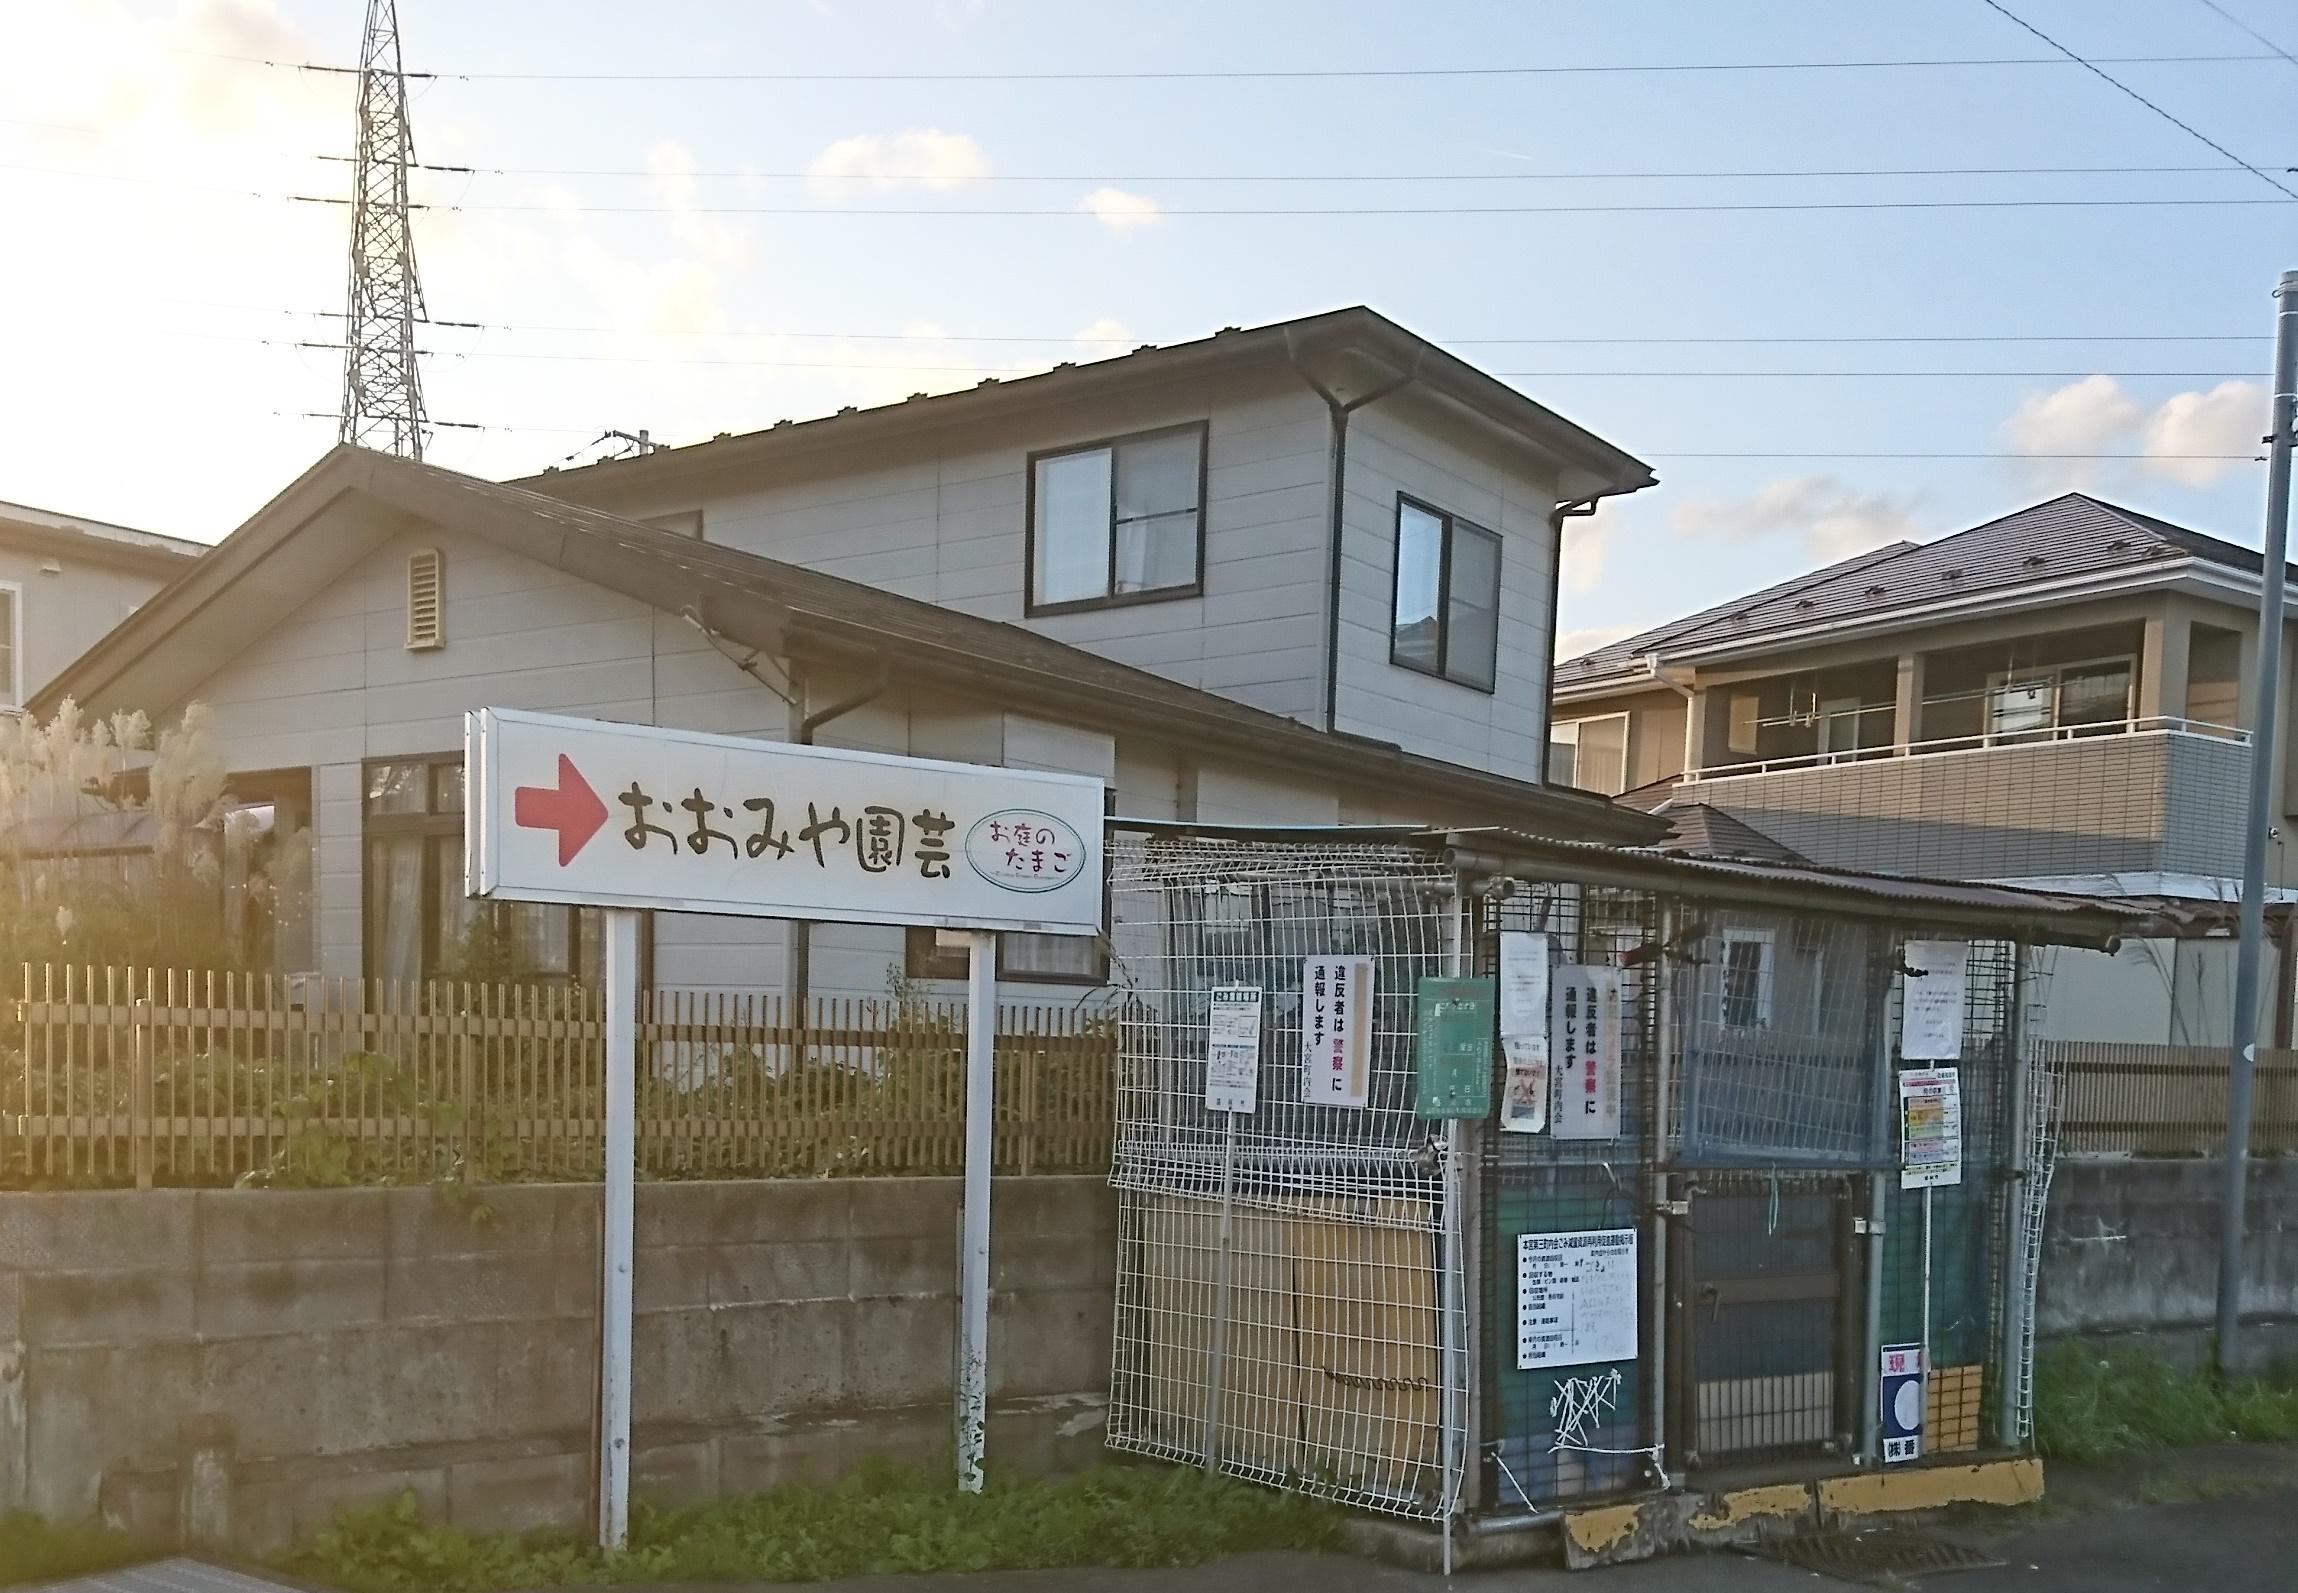 Station photo